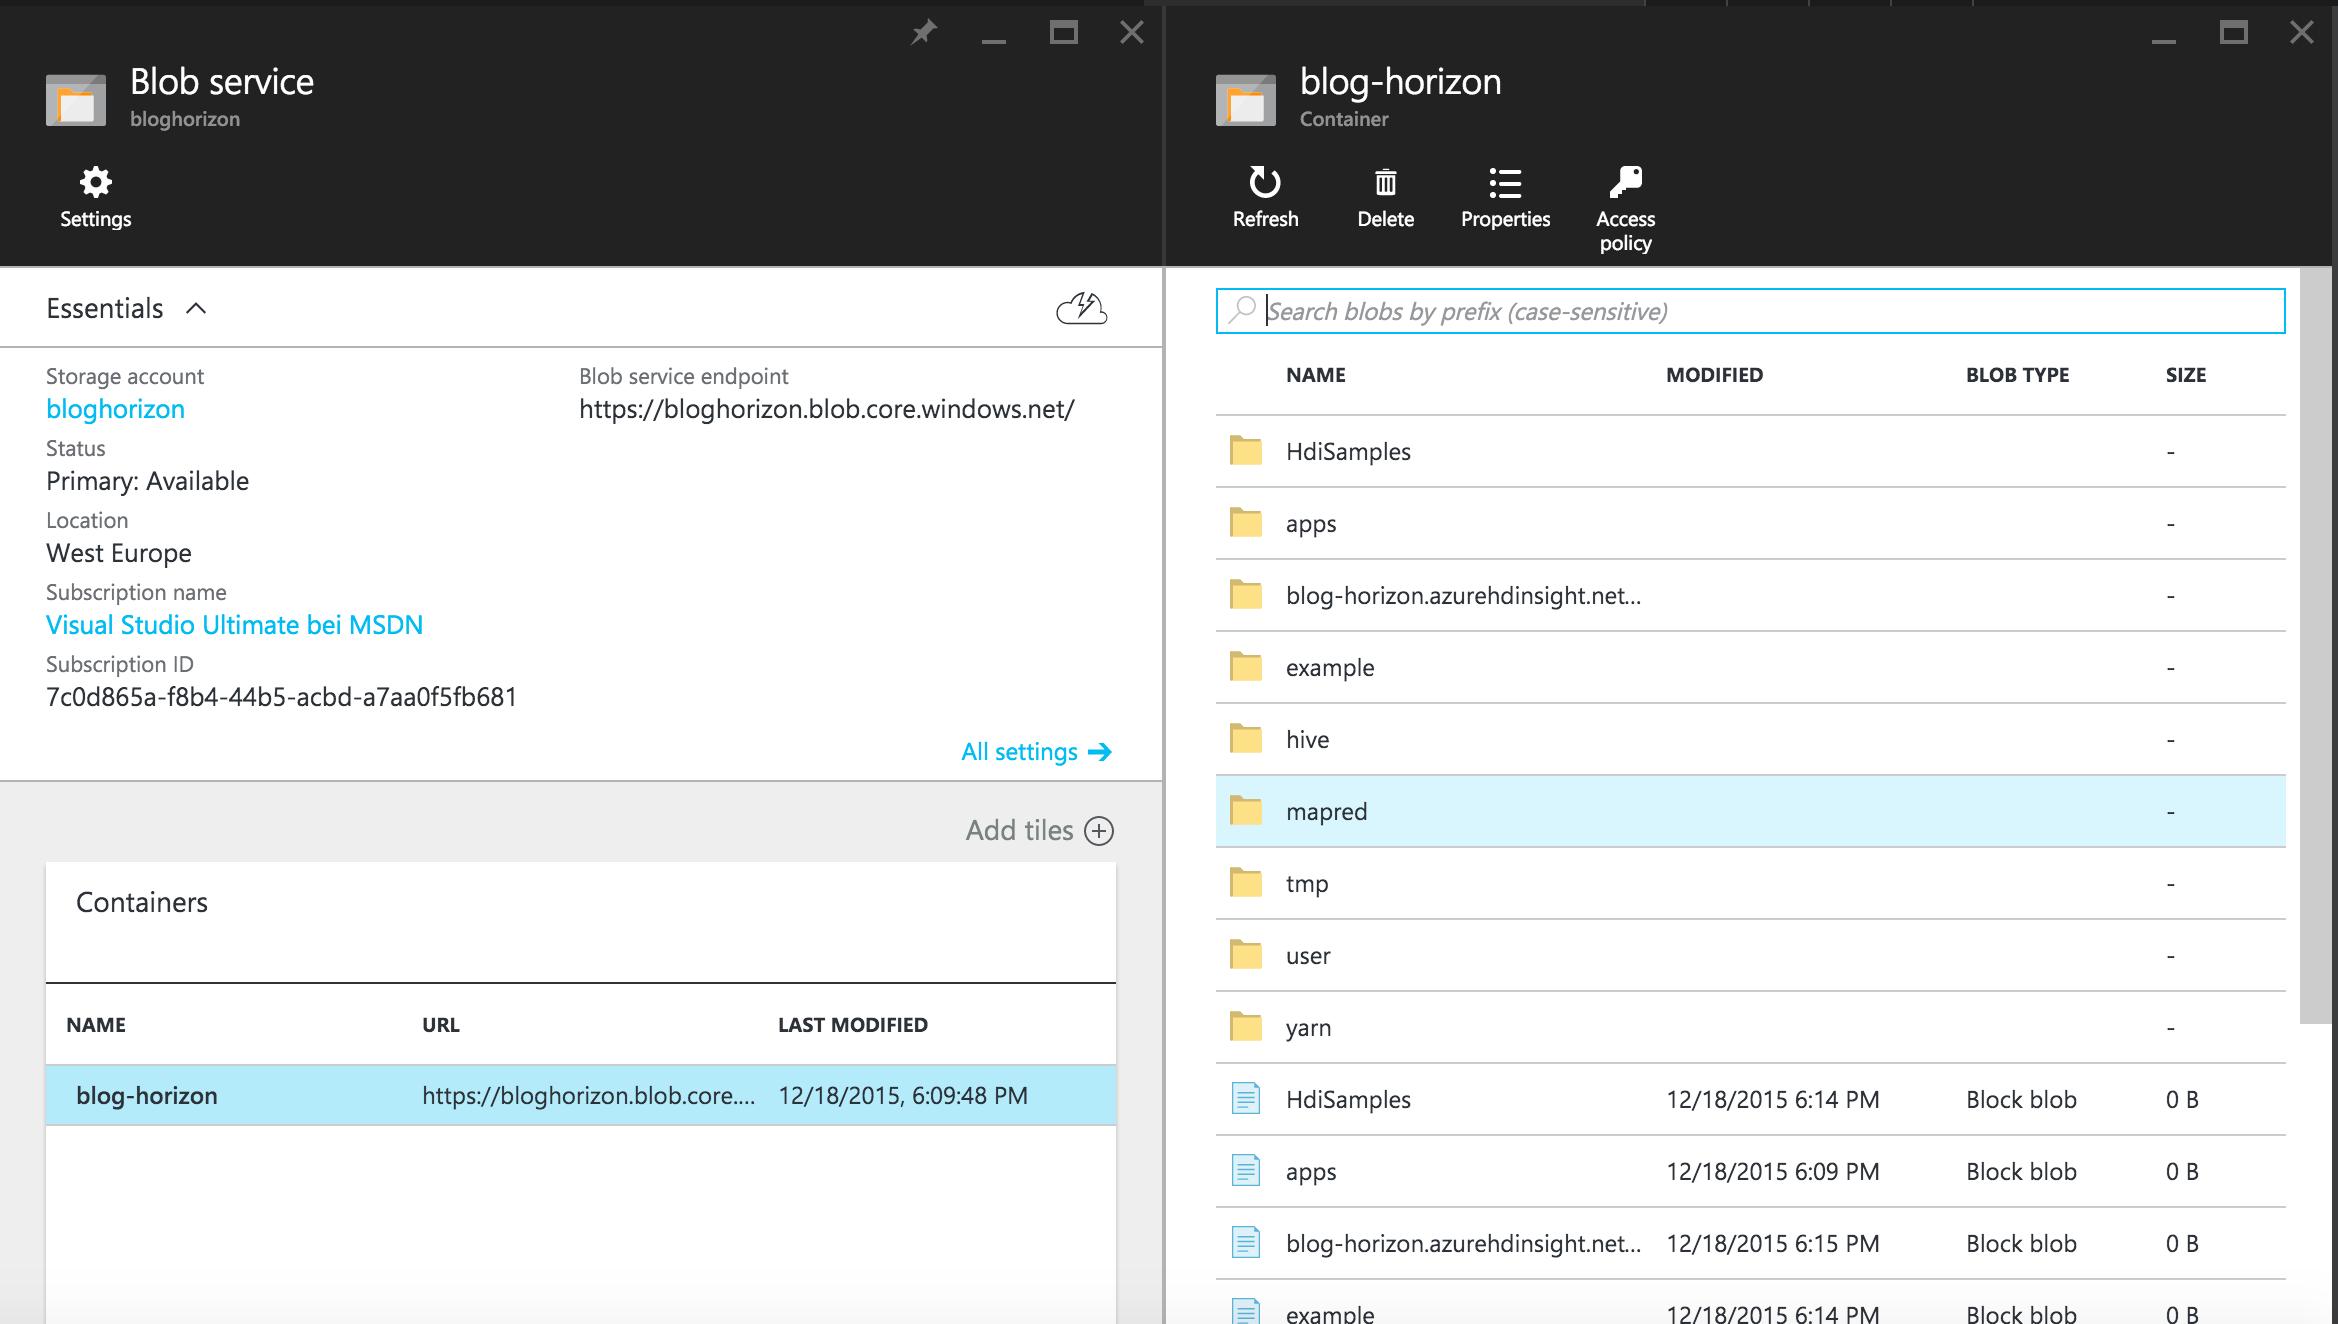 Zeppelin and Spark SQL on HDInsight   Jan @ Development